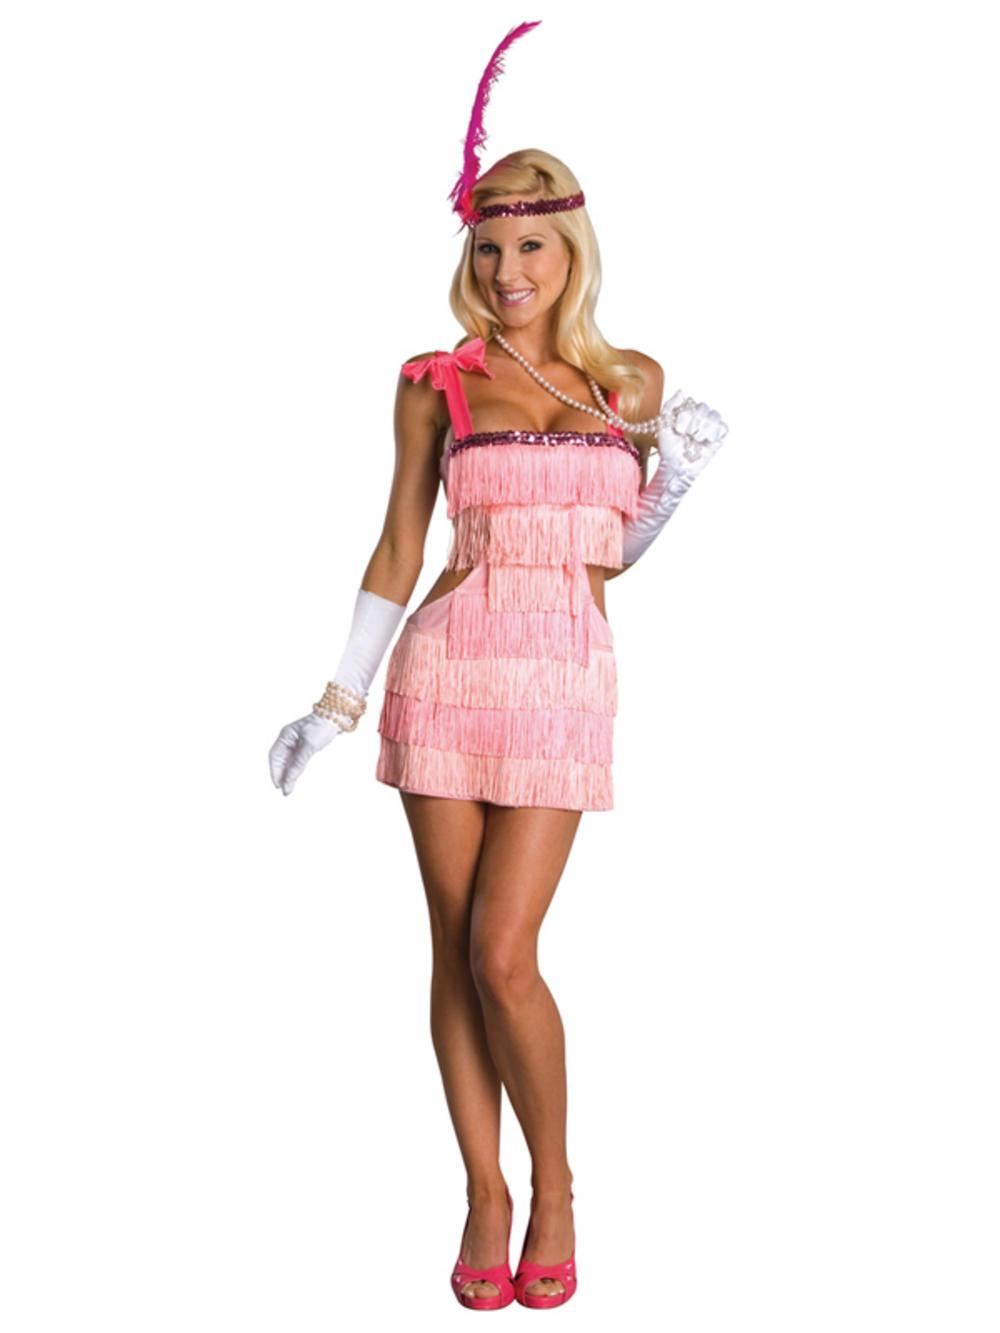 Womens 1920s flapper dress fancy dress costume adult flapper dress - Adult Pink Flapper 1920s 20s Fancy Dress Costume Ladies Womens Female